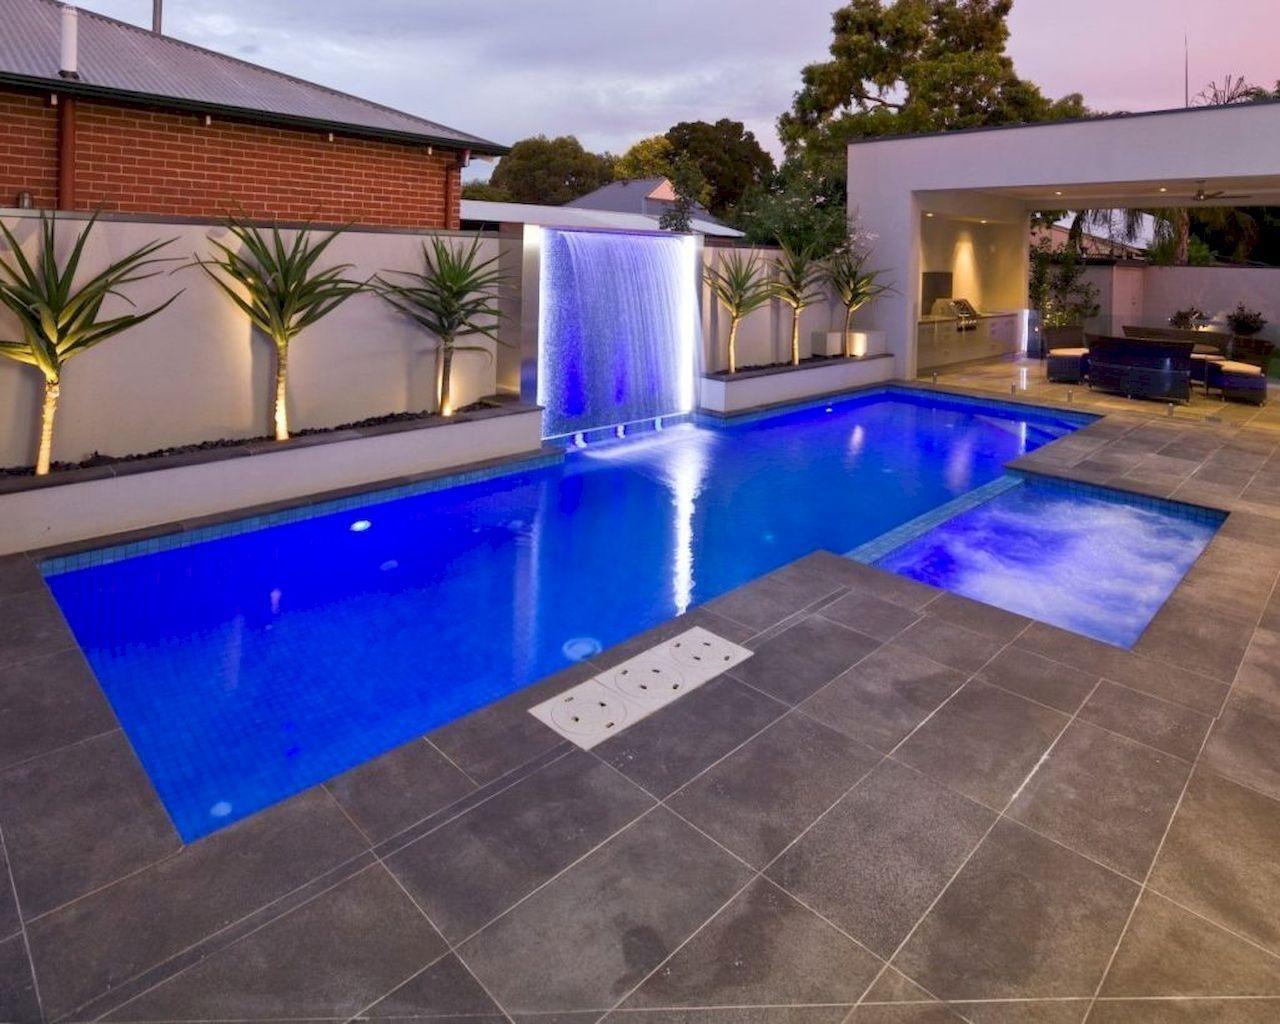 Pin By Pools Pools Pools On Backyard Pools Small Backyard Pools Concrete Swimming Pool Modern Pools